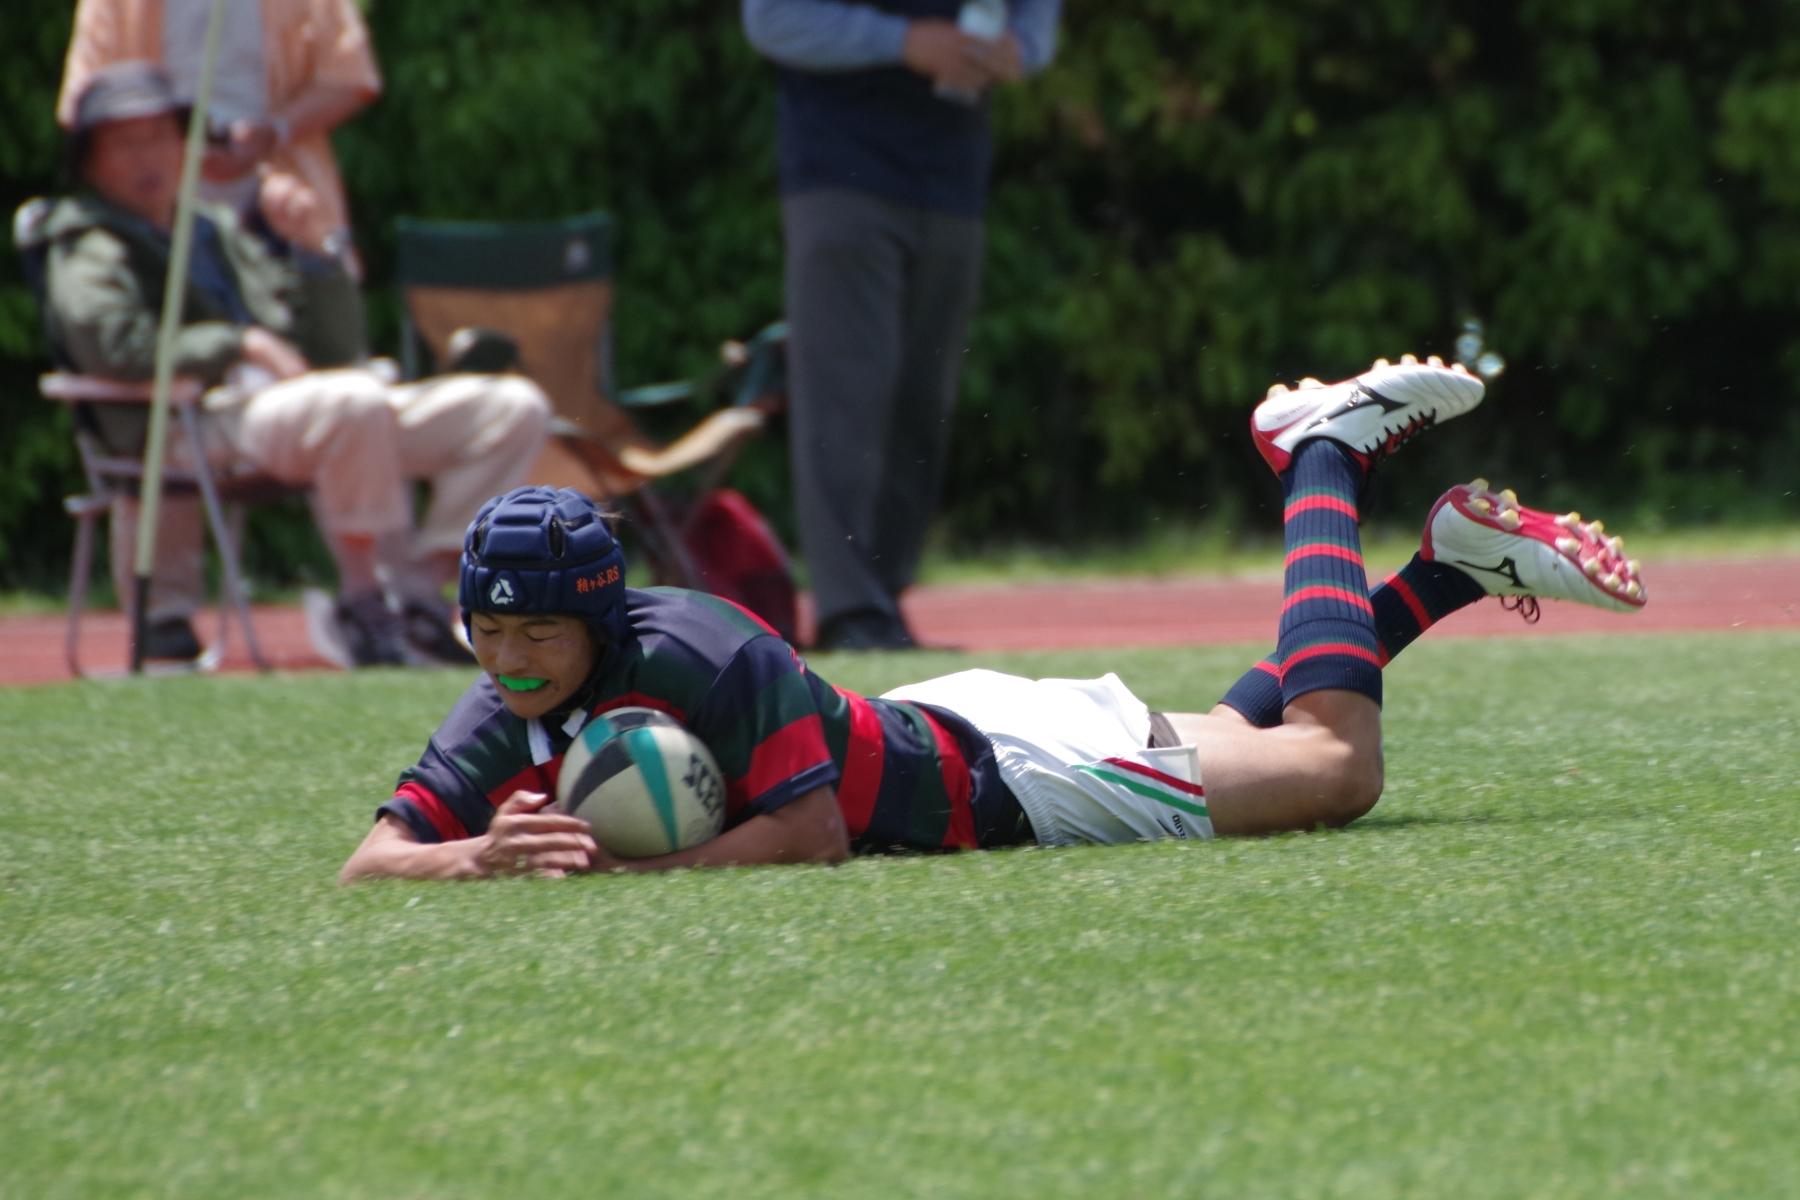 http://kokura-rugby.sakura.ne.jp/180520_123854_0307.jpg